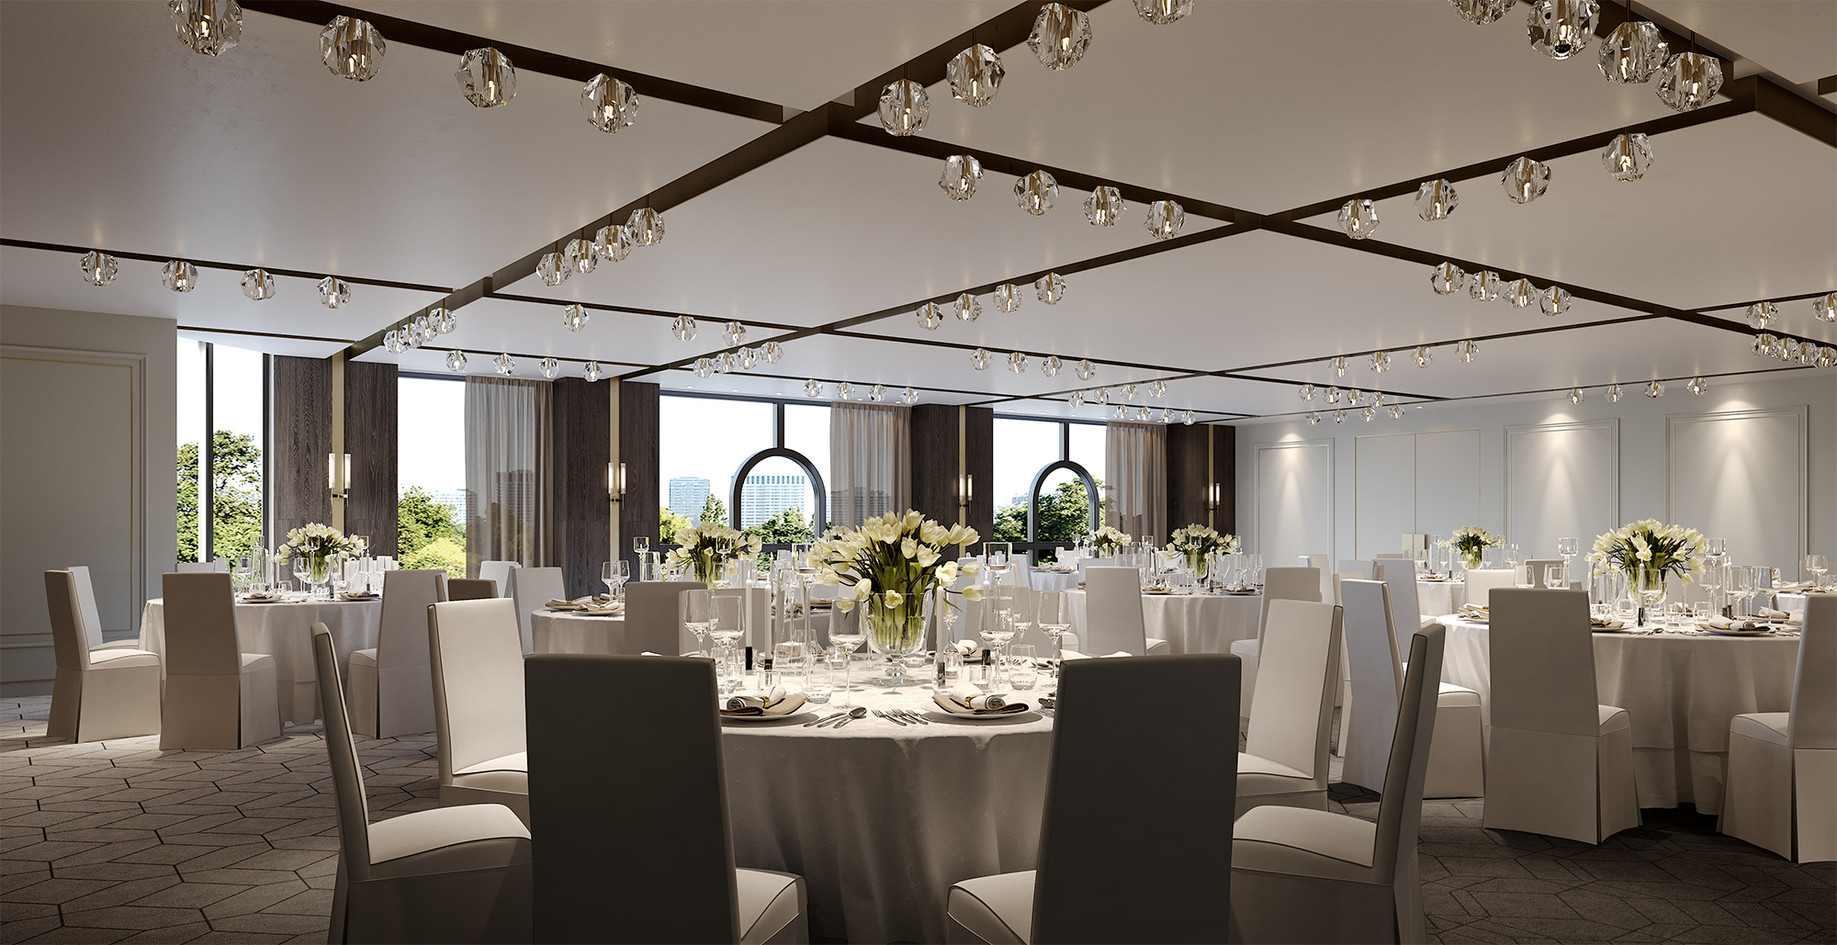 003_Hyde Park Room_Banquet_Render.jpg